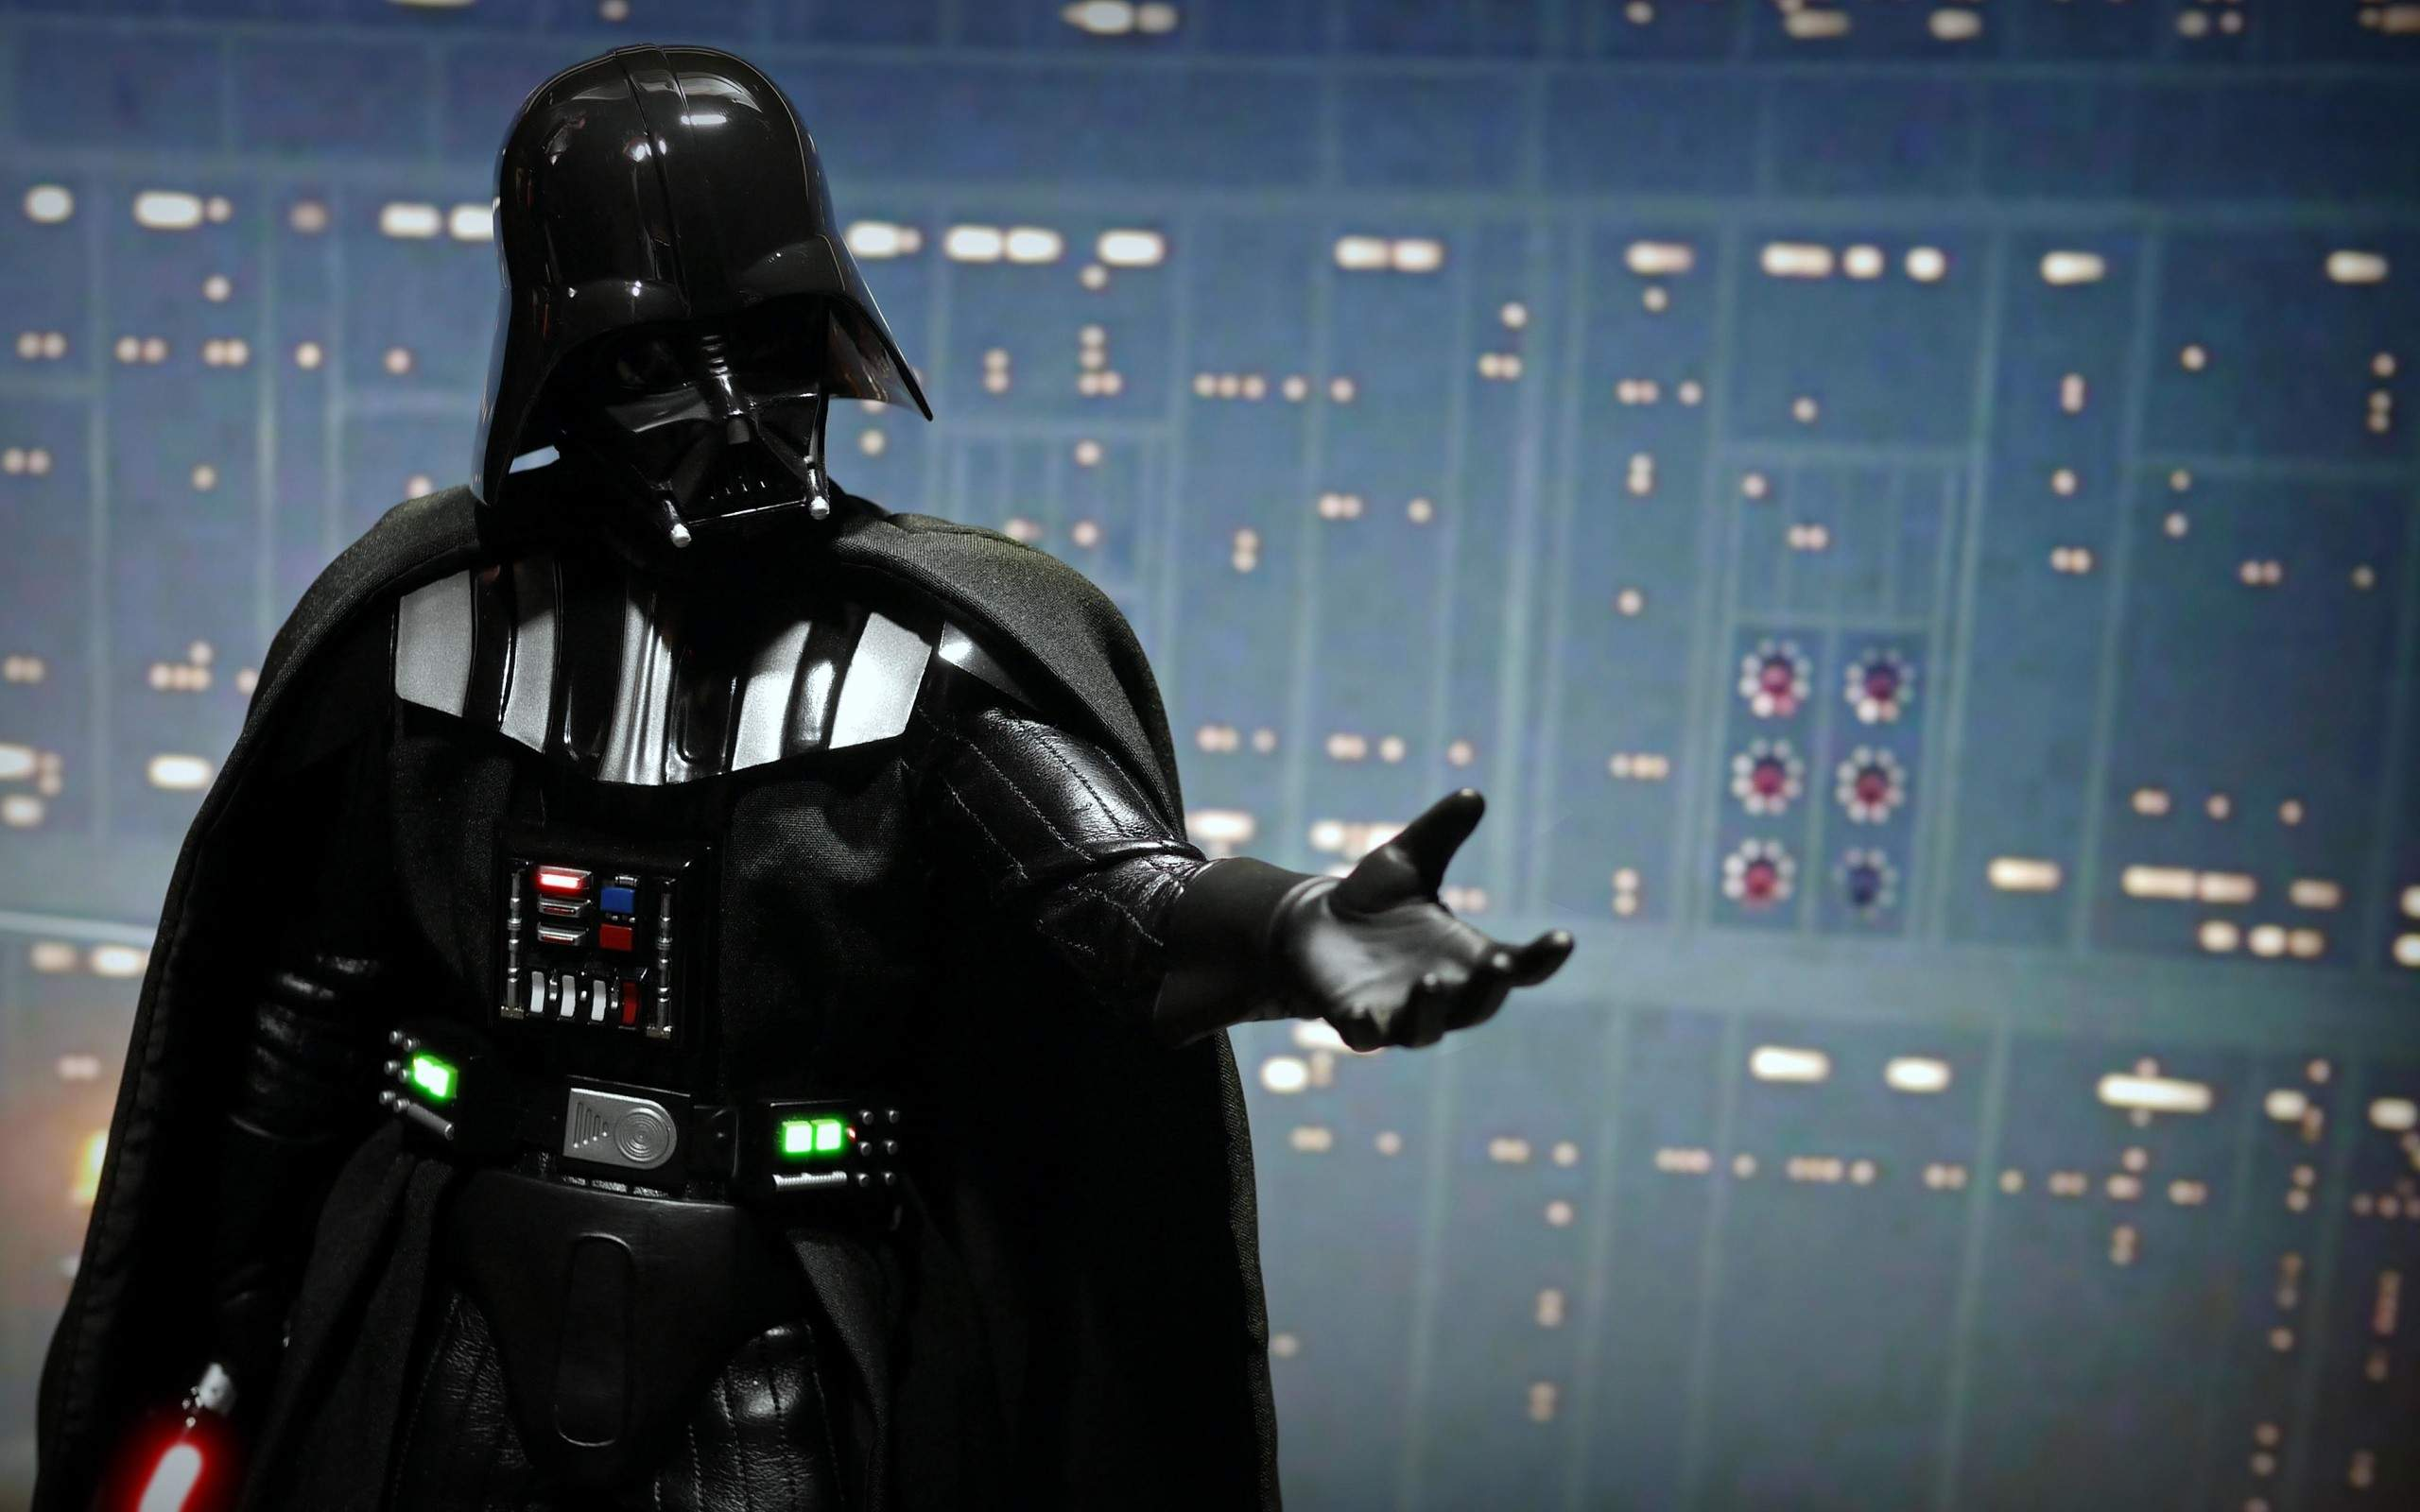 Star Wars Darth Vader Wallpaper Darth Vader On Death Star 72015 Hd Wallpaper Backgrounds Download